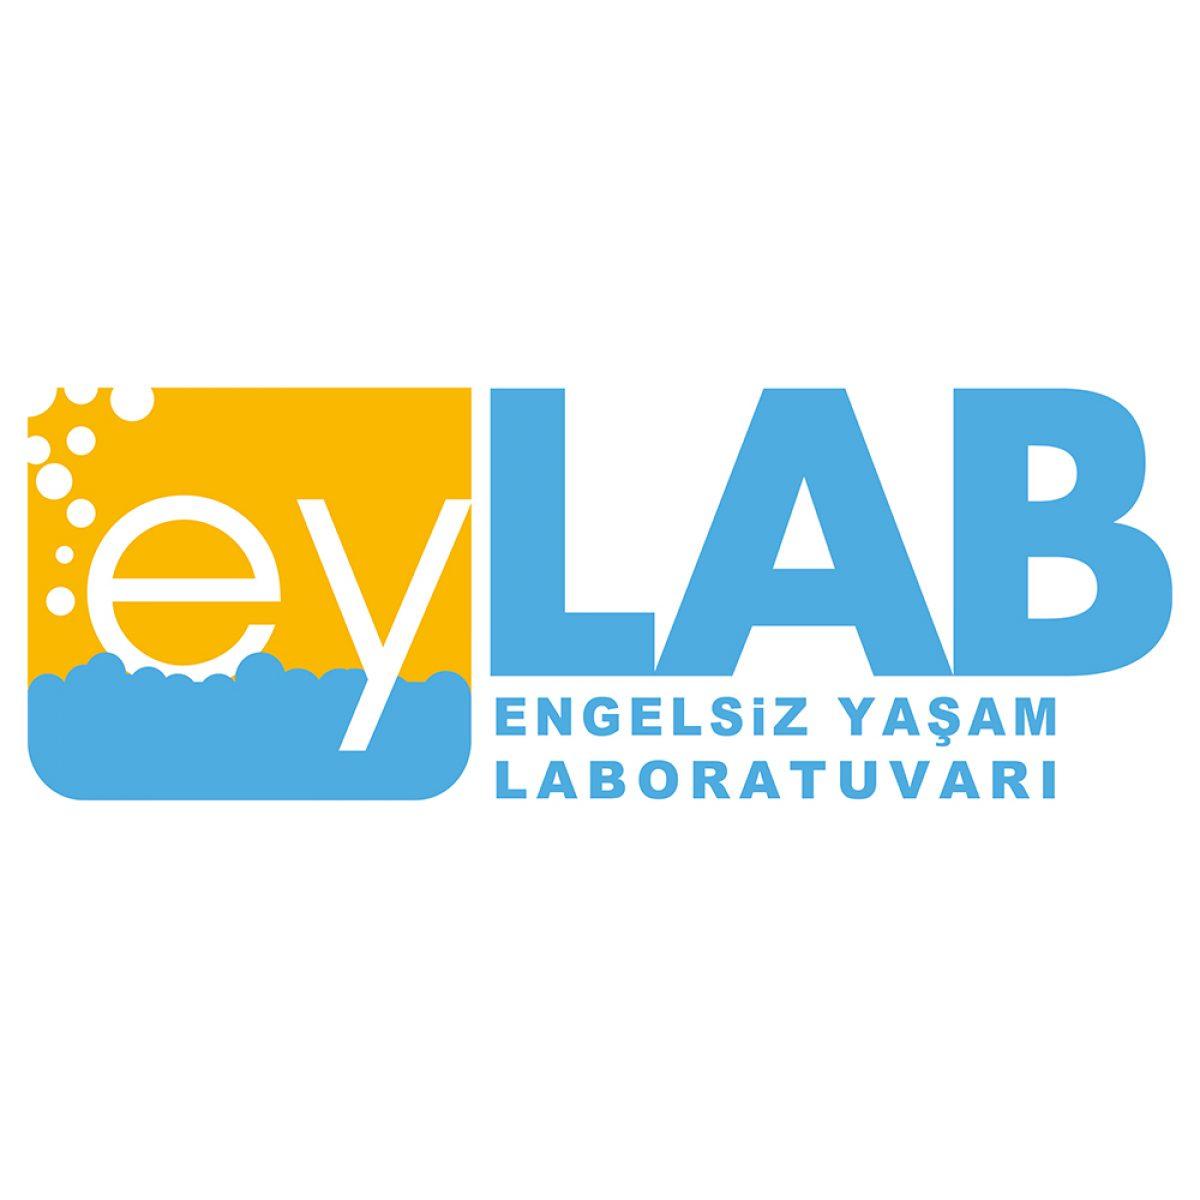 eyLAB logo